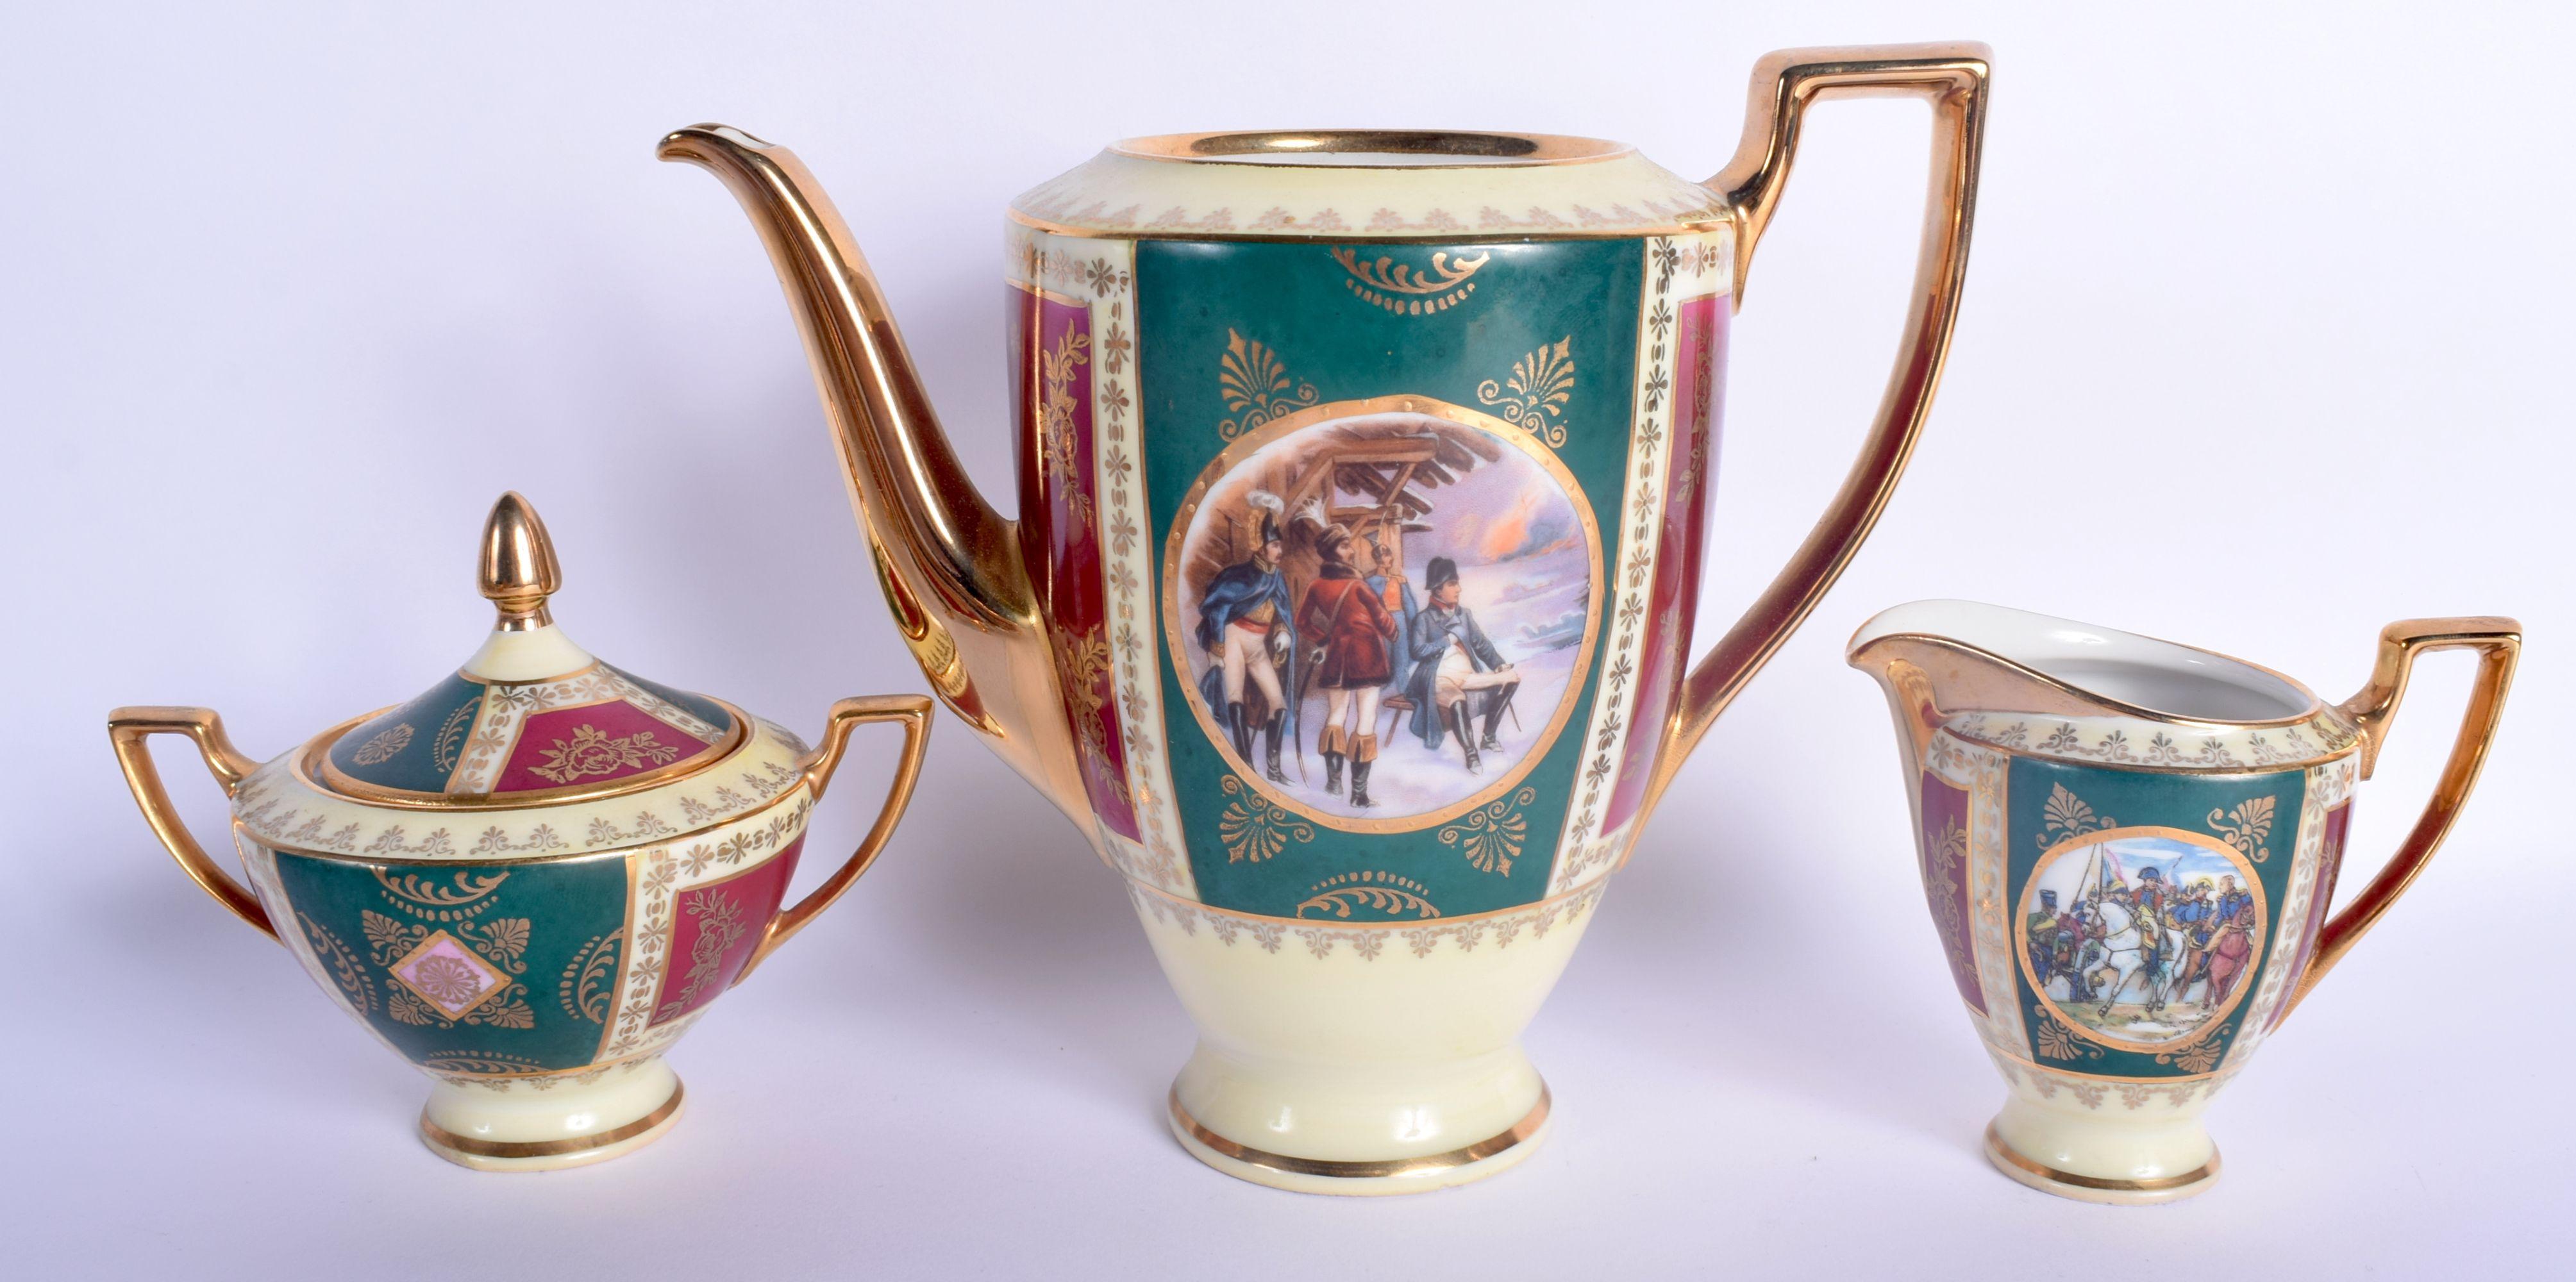 A VINTAGE J K CARLSBAD BAVARIA PORCELAIN VIENNA STYLE TEASET decorated with Napoleonic scenes. Large - Image 8 of 22